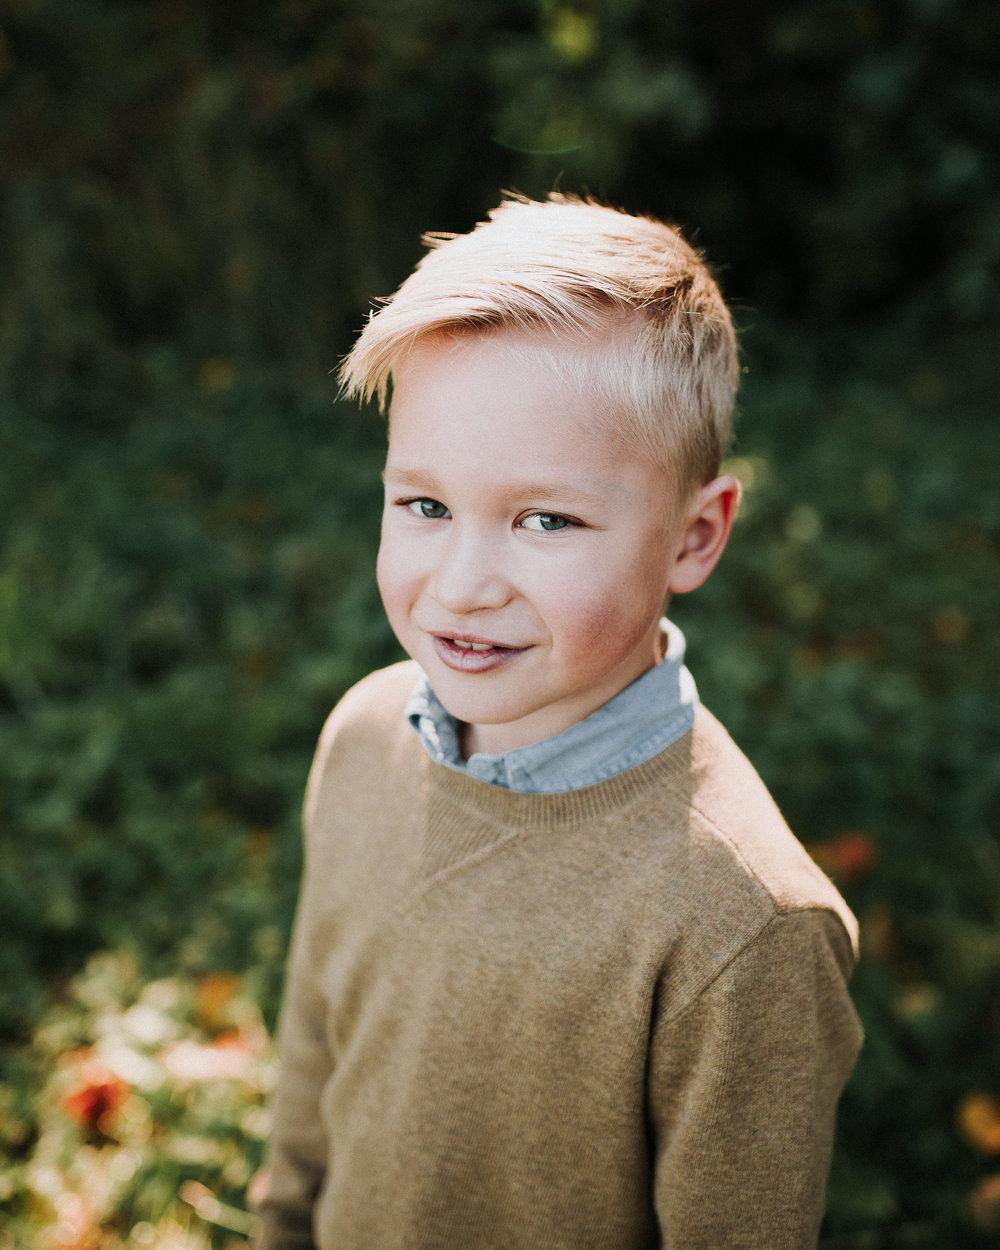 Family-Photographer-Bellingham-WA-Brianne-Bell-Photography-(Kaiser)